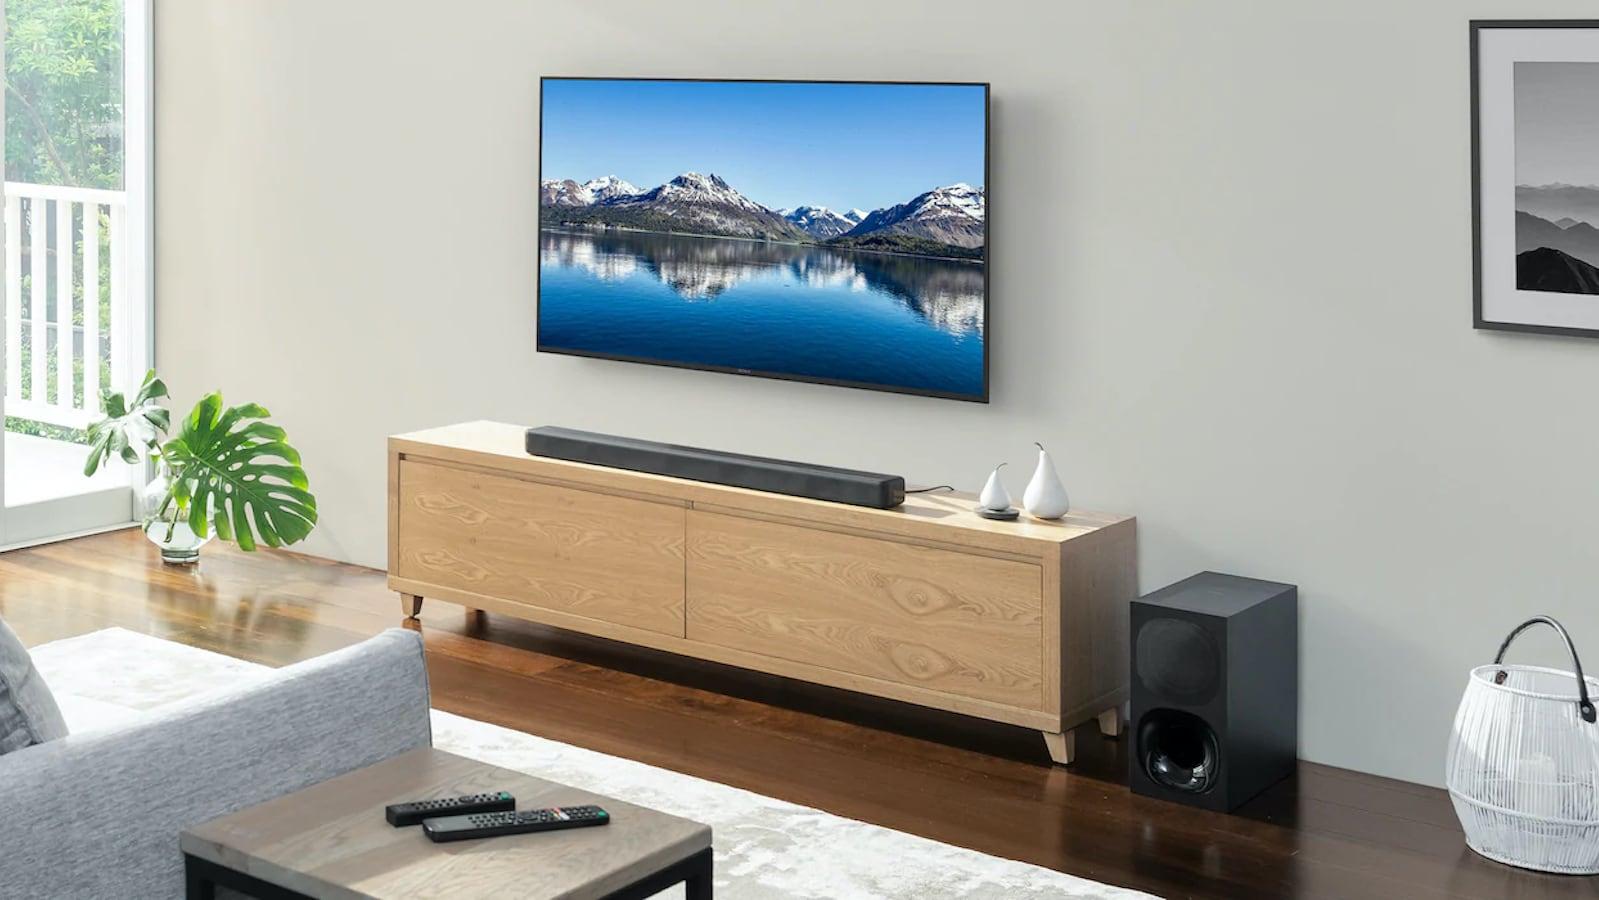 Sony HT-G700 Dolby Atmos Soundbar